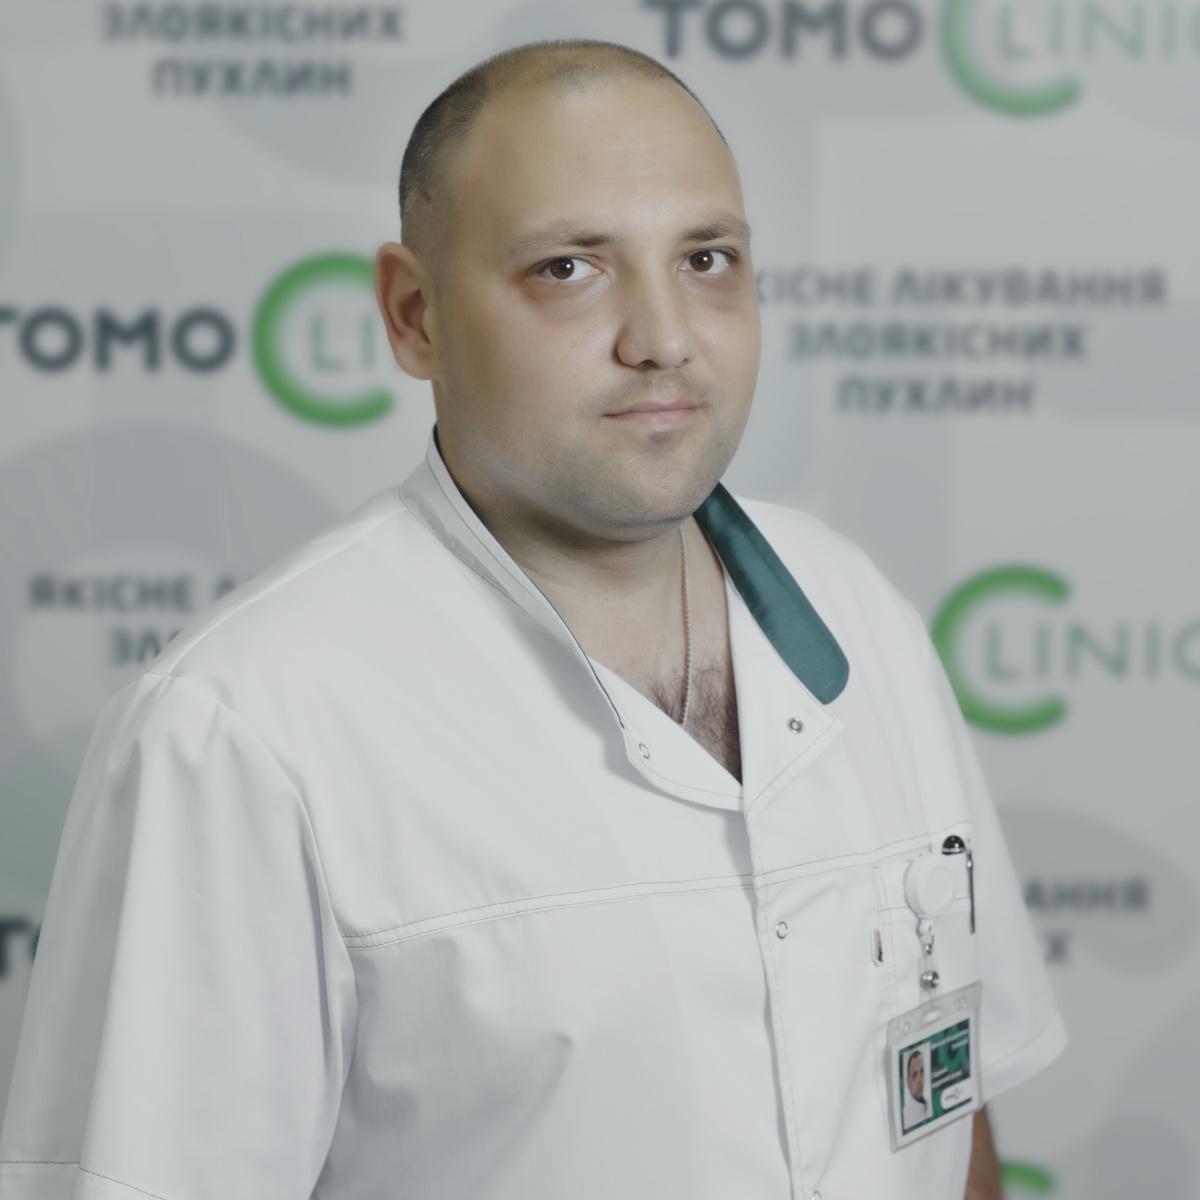 Gumenyuk Tomoclinic